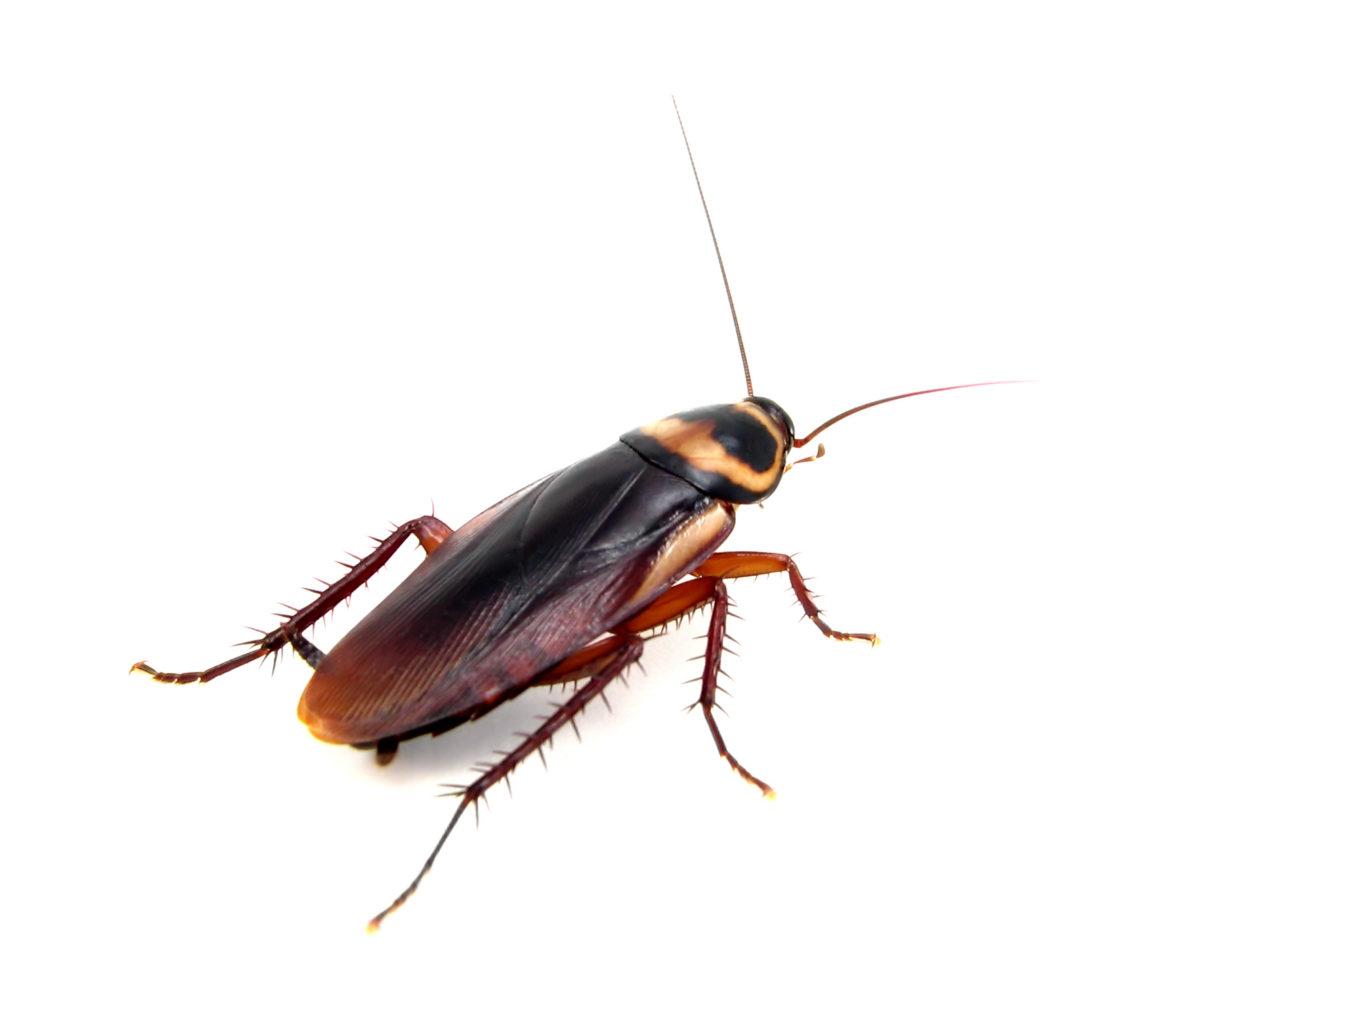 Cockroach Extermination